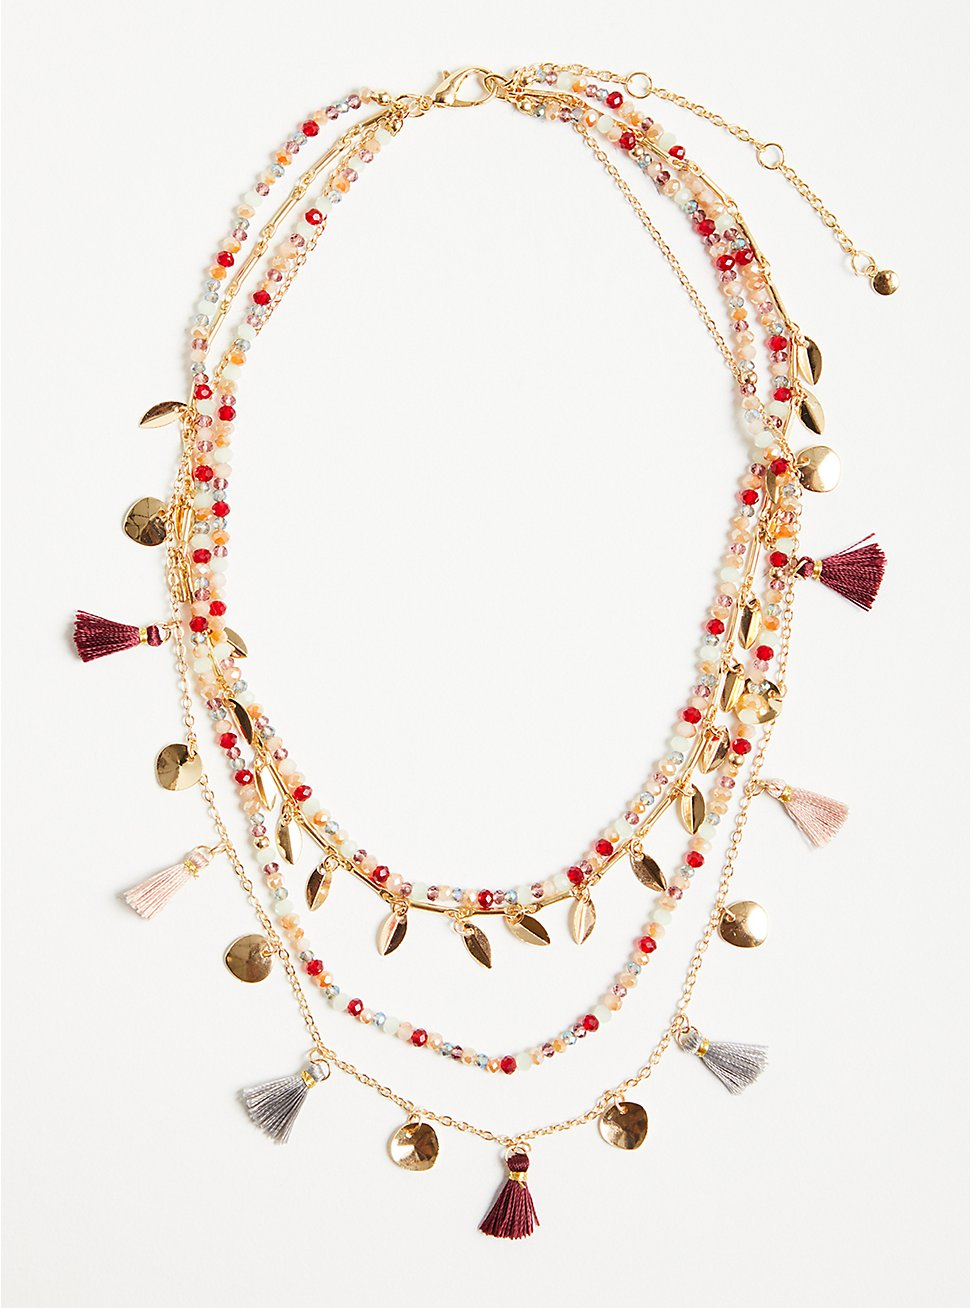 Tassel Layered Necklace - Gold Tone, Blush & Wine, , hi-res